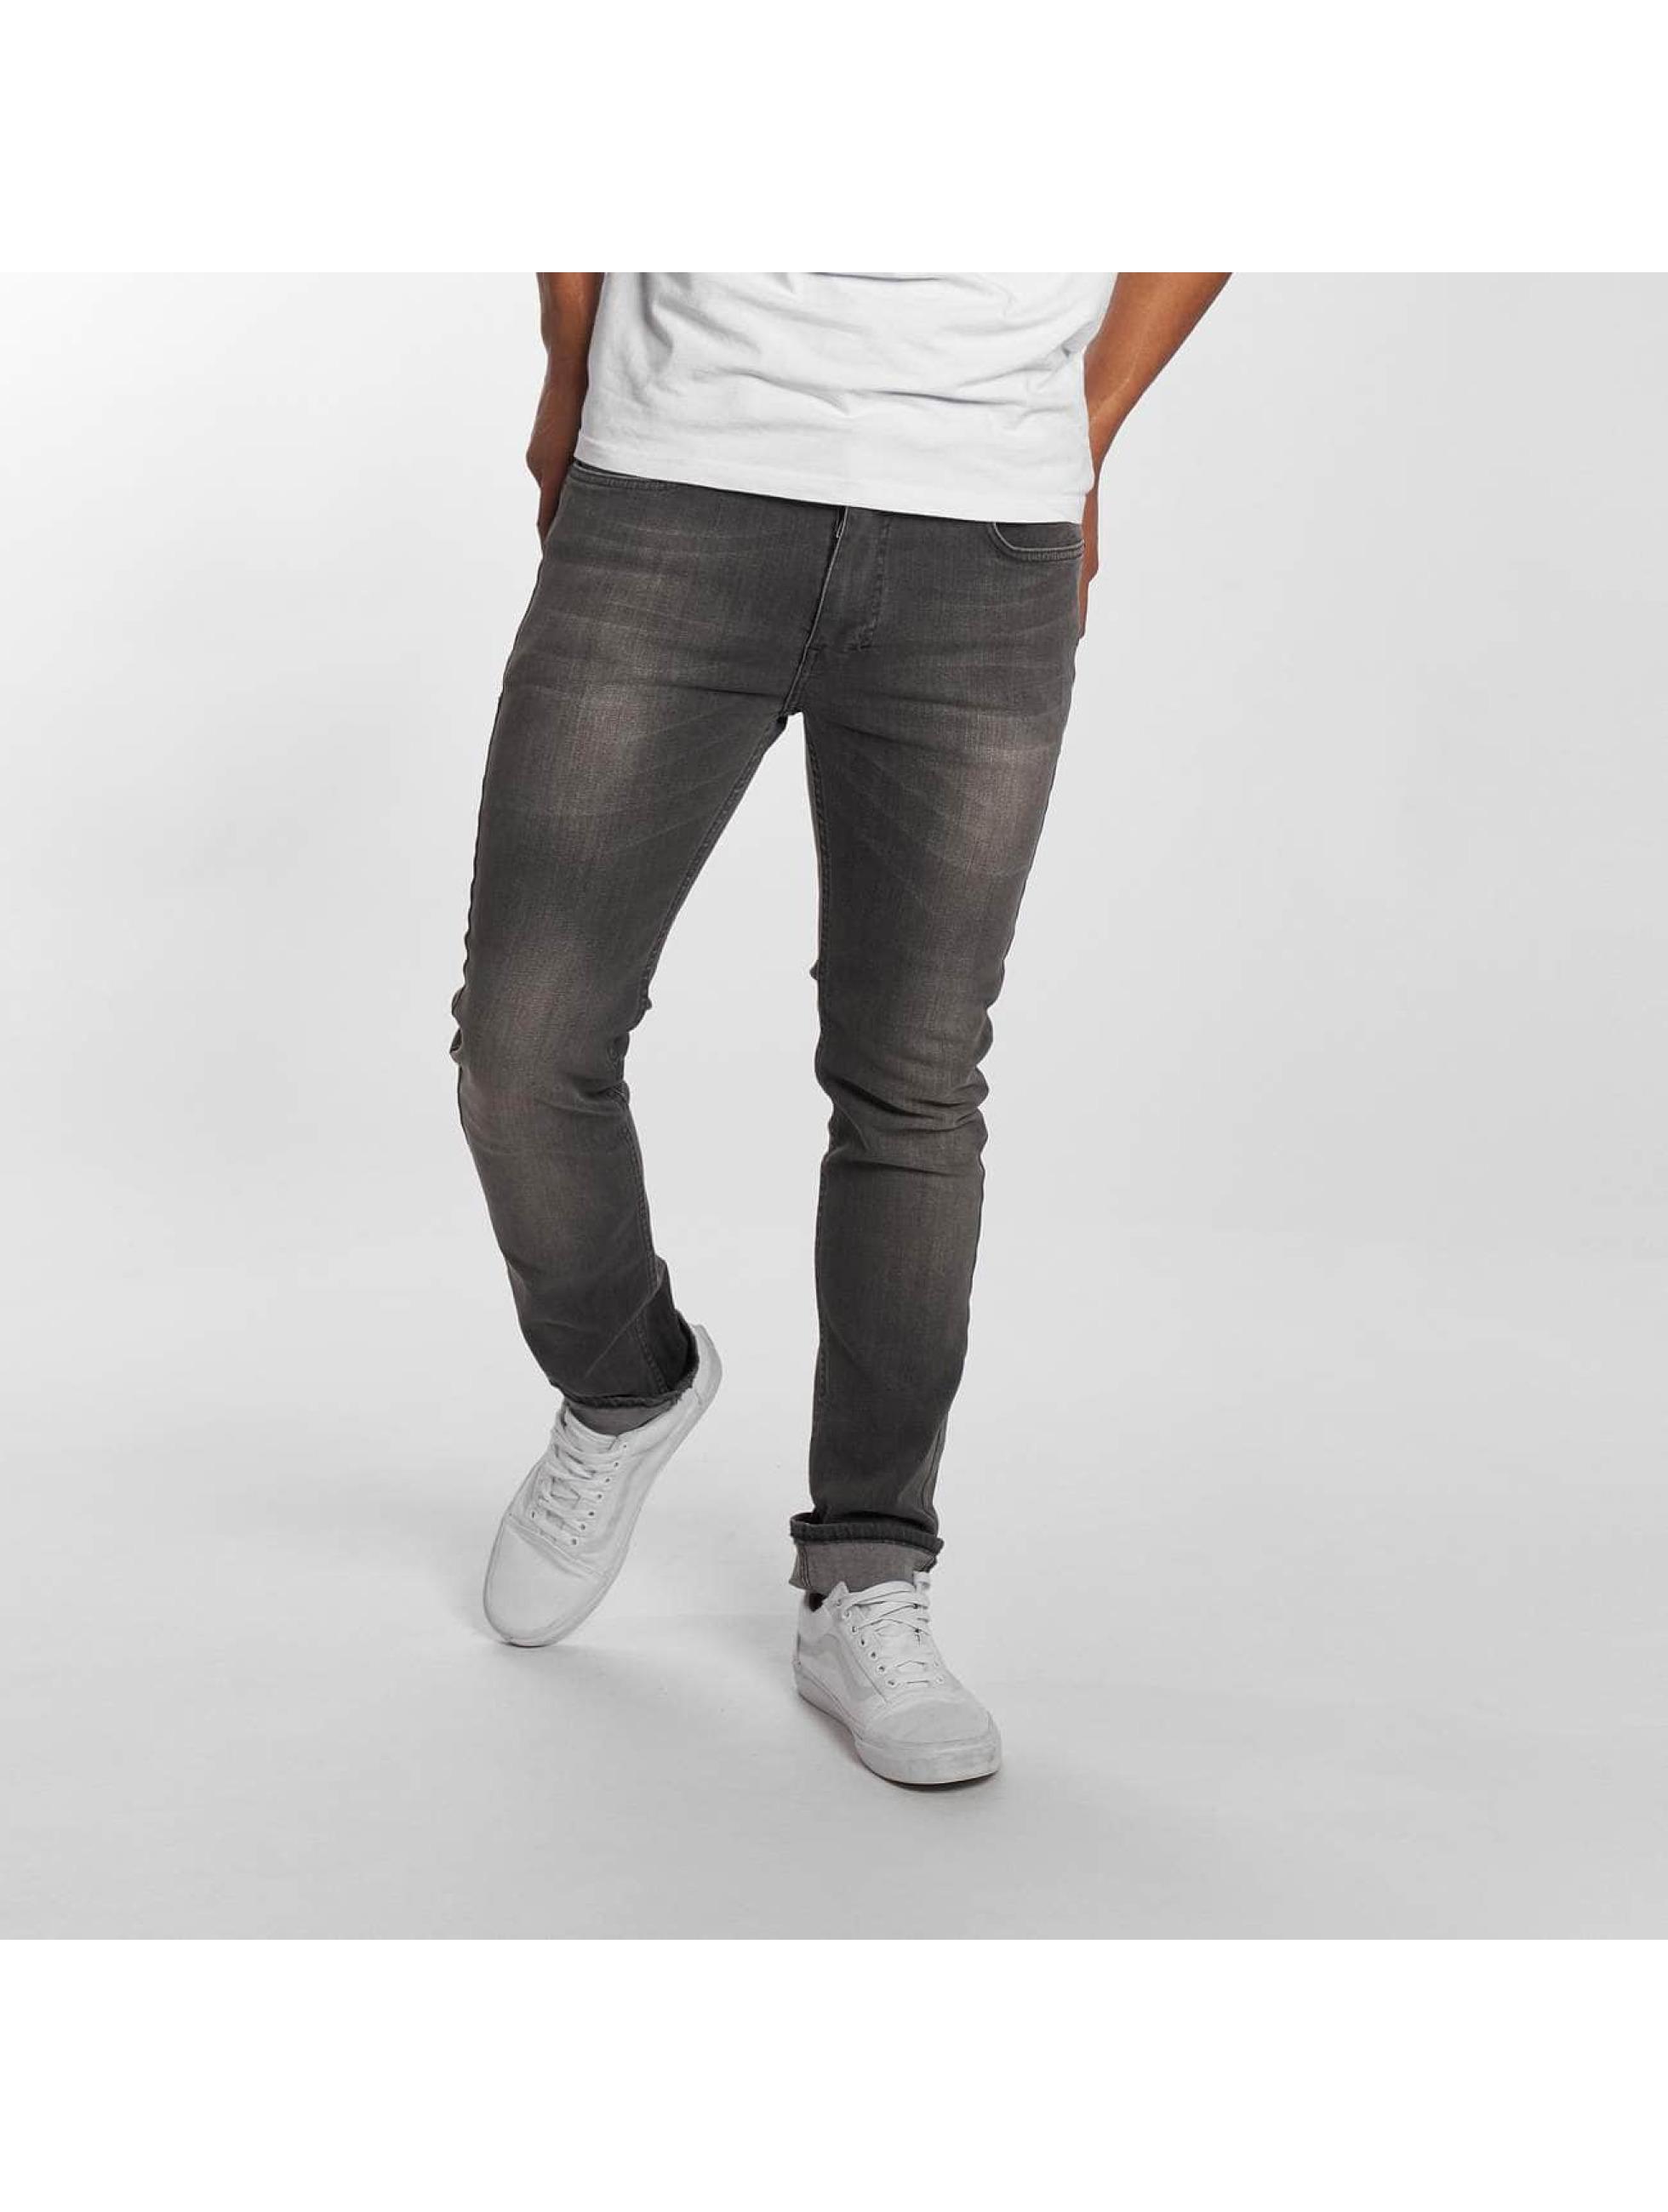 Religion Skinny jeans Noize bruin